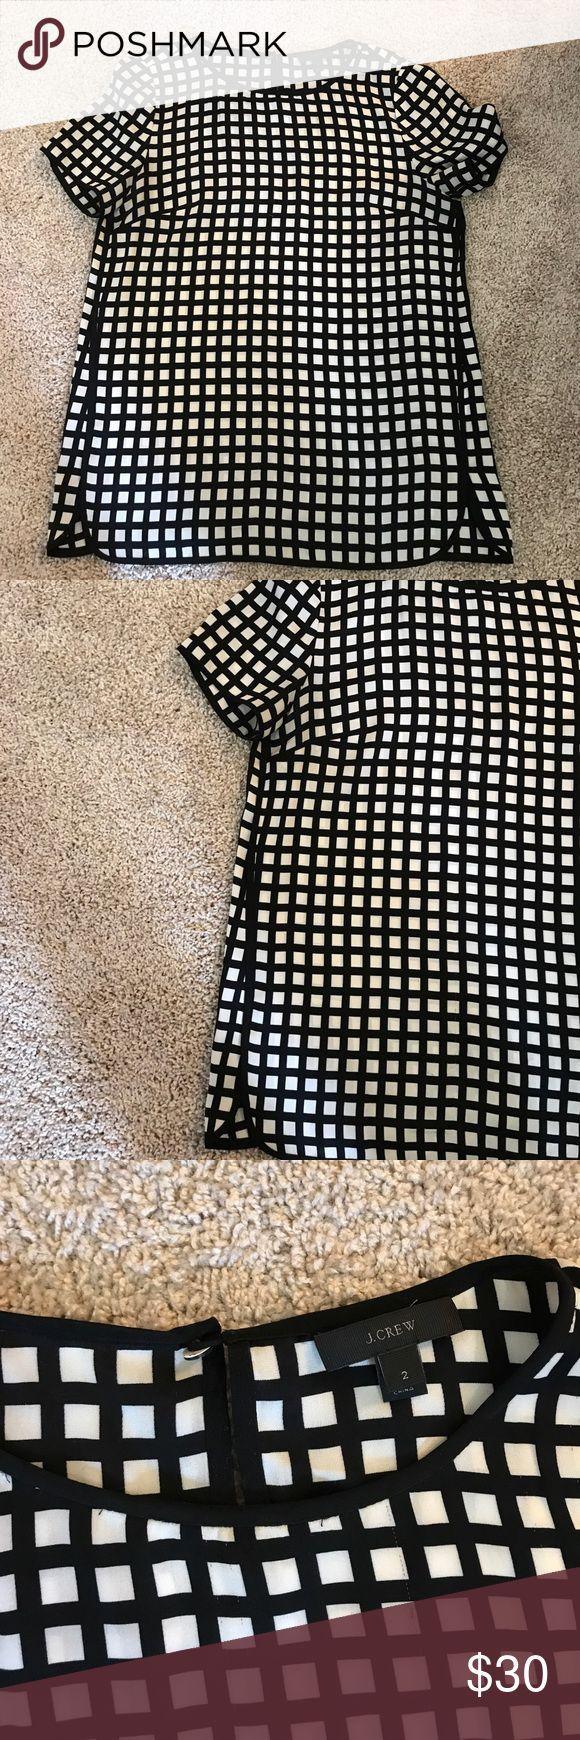 J Crew Black and White Short Sleeve Blouse 92% Silk, 8% Spandex. Short sleeve blouse. Black and white geometric print. Size 2. J Crew. J. Crew Tops Blouses